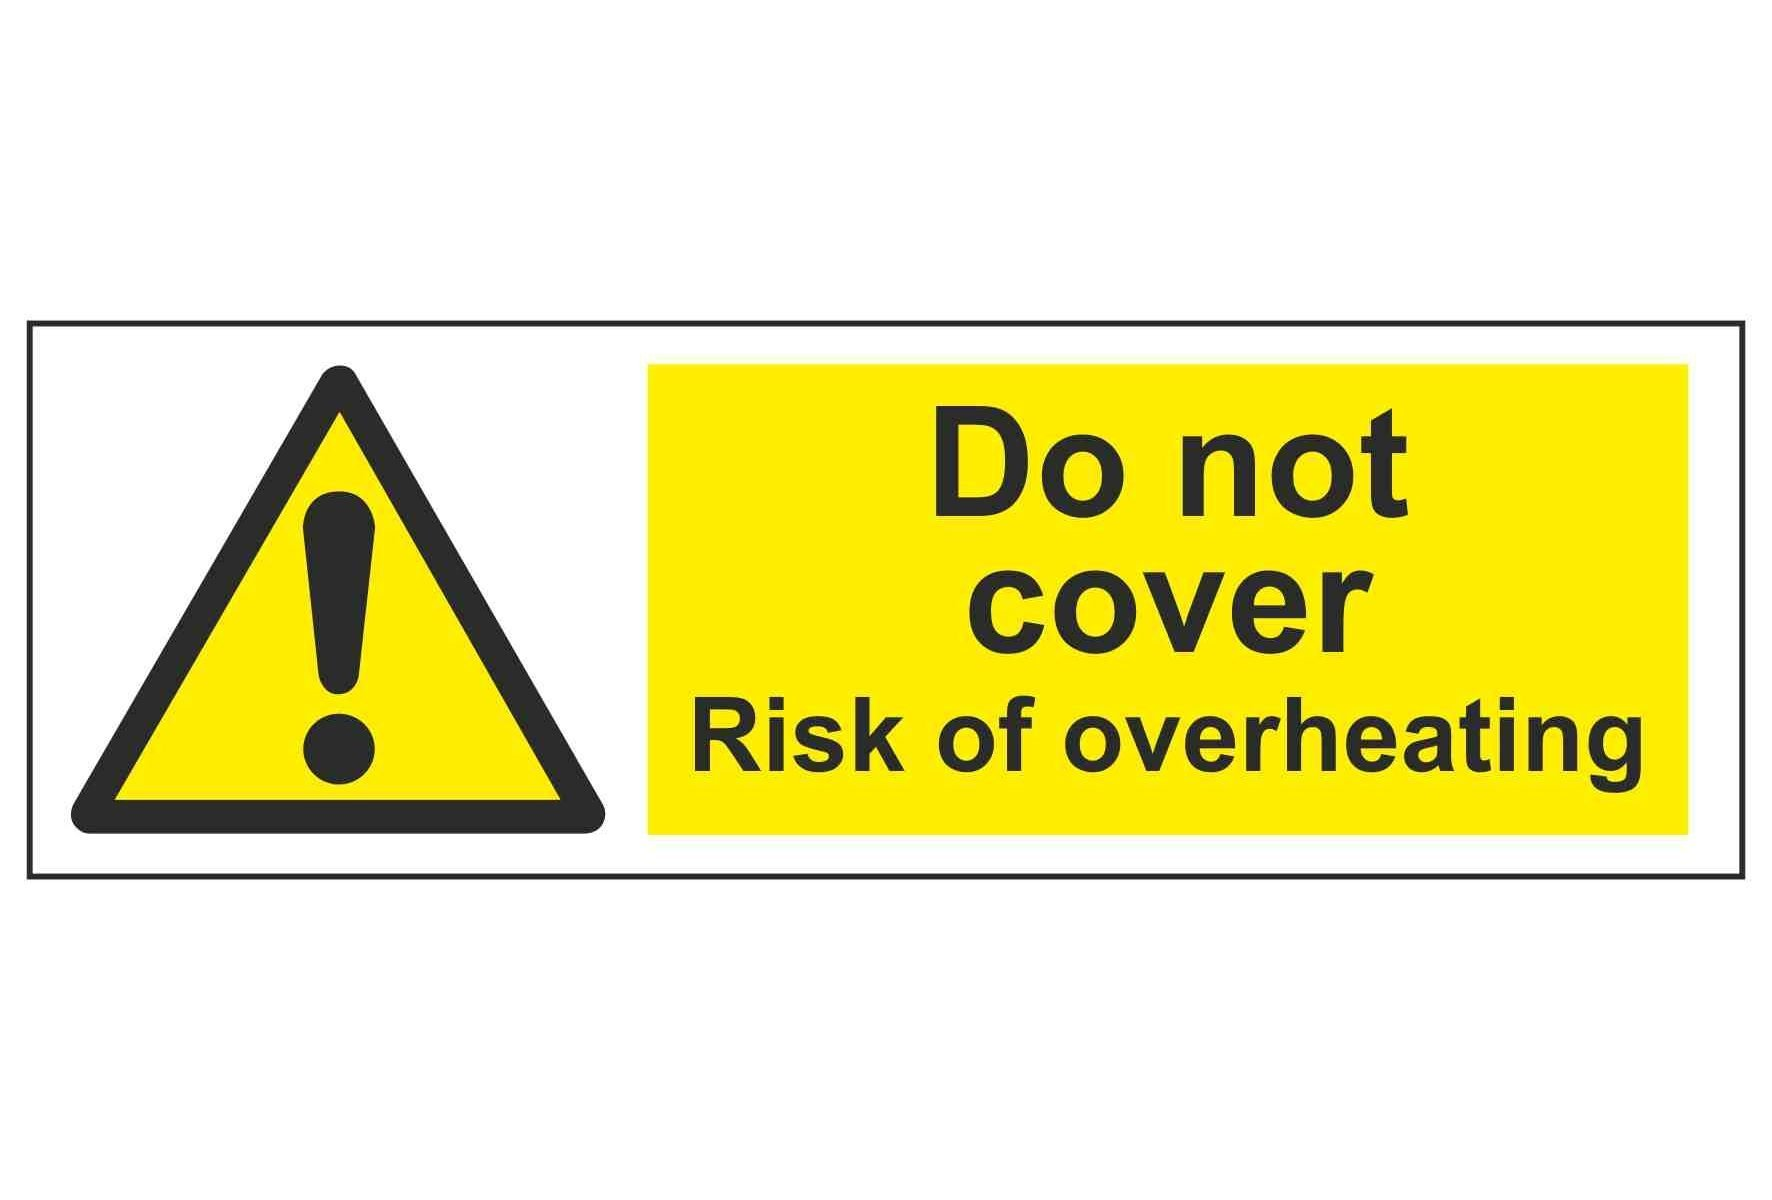 Do not cover Risk of overheating